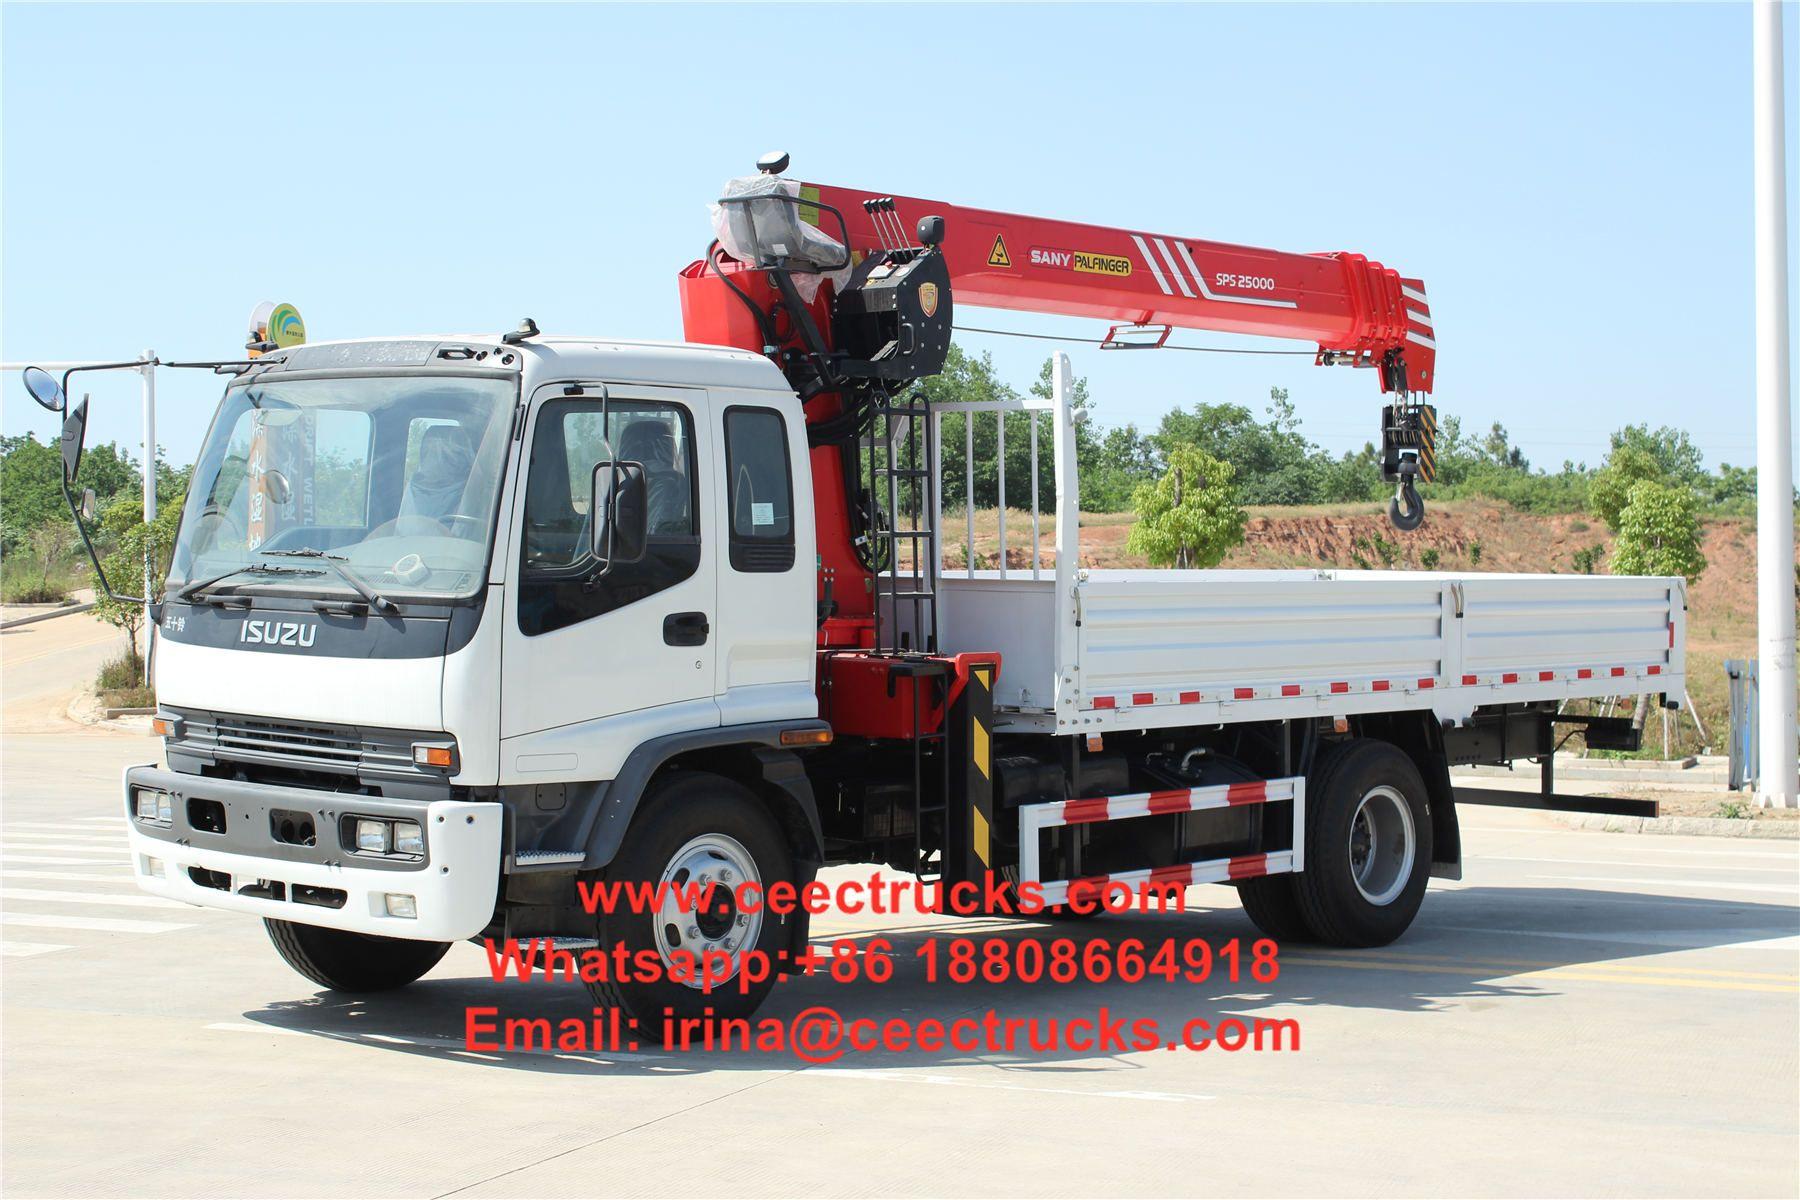 Isuzu Ftr 10tons Truck Mounted Crane Truck Mounted Crane Trucks Hydraulic Systems